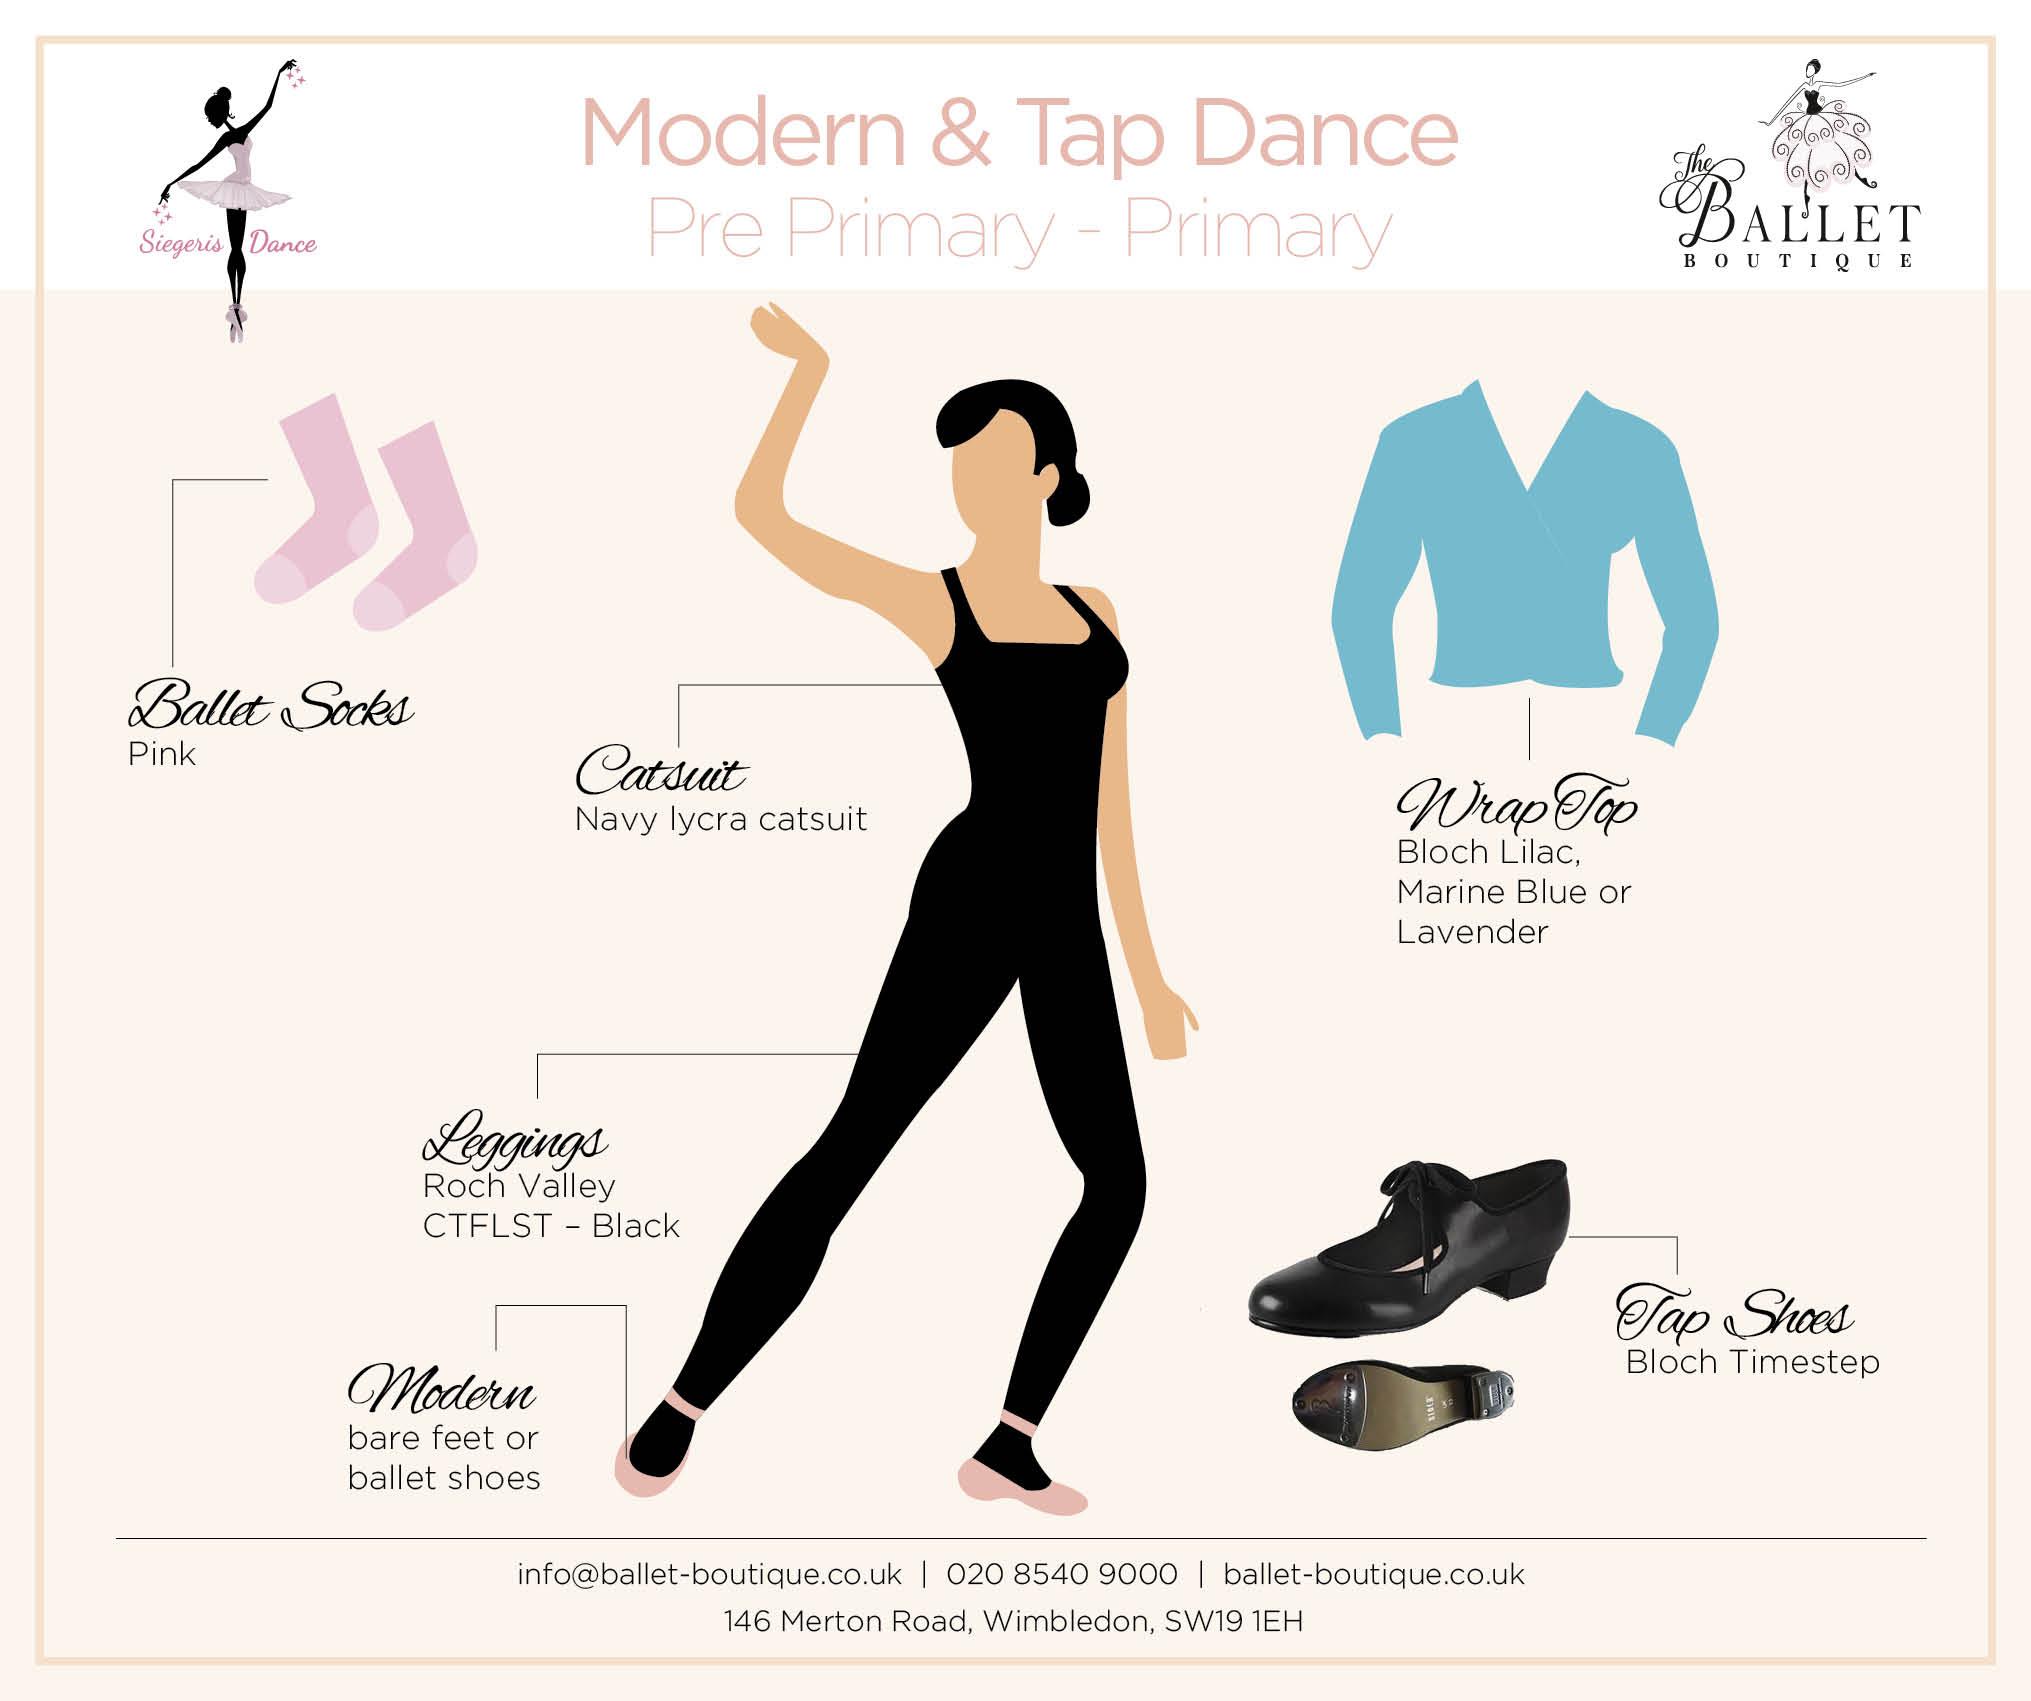 modern-tap-dance-pre-primary-primary